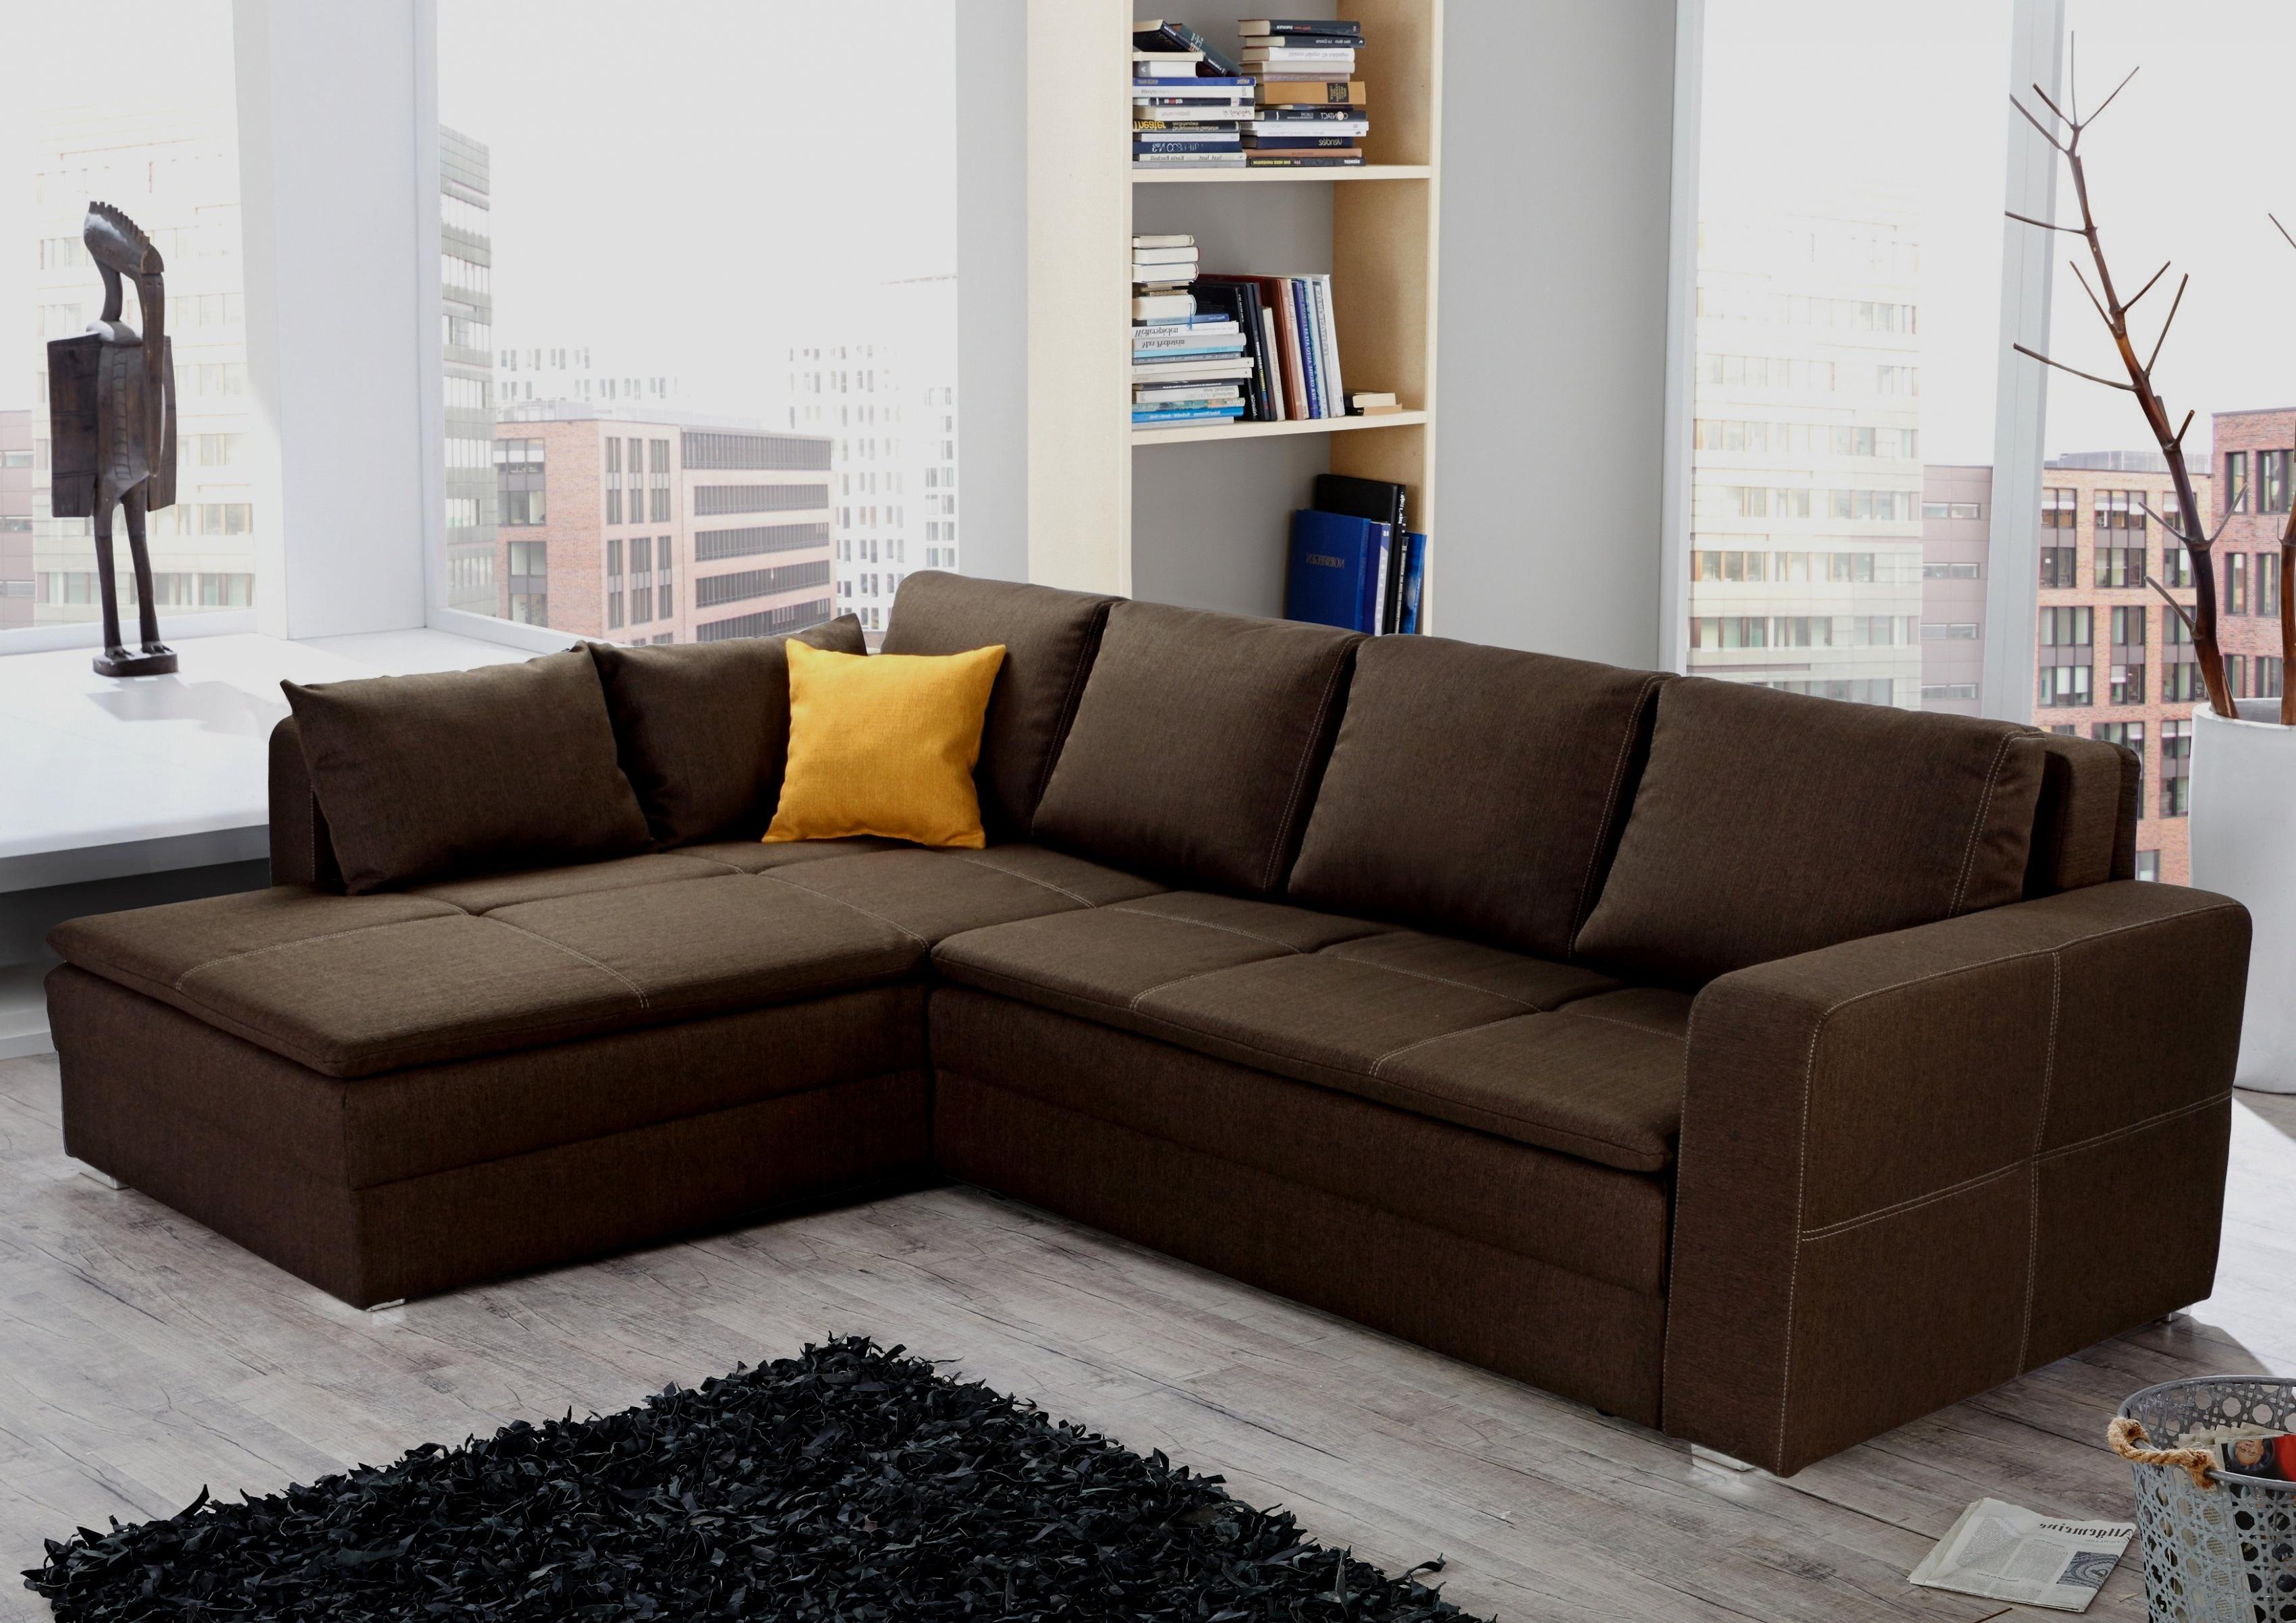 Sofas Bonitos 9ddf sofas Bonitos Lindo 34 Inspirational Modular sofa Busco Sillas